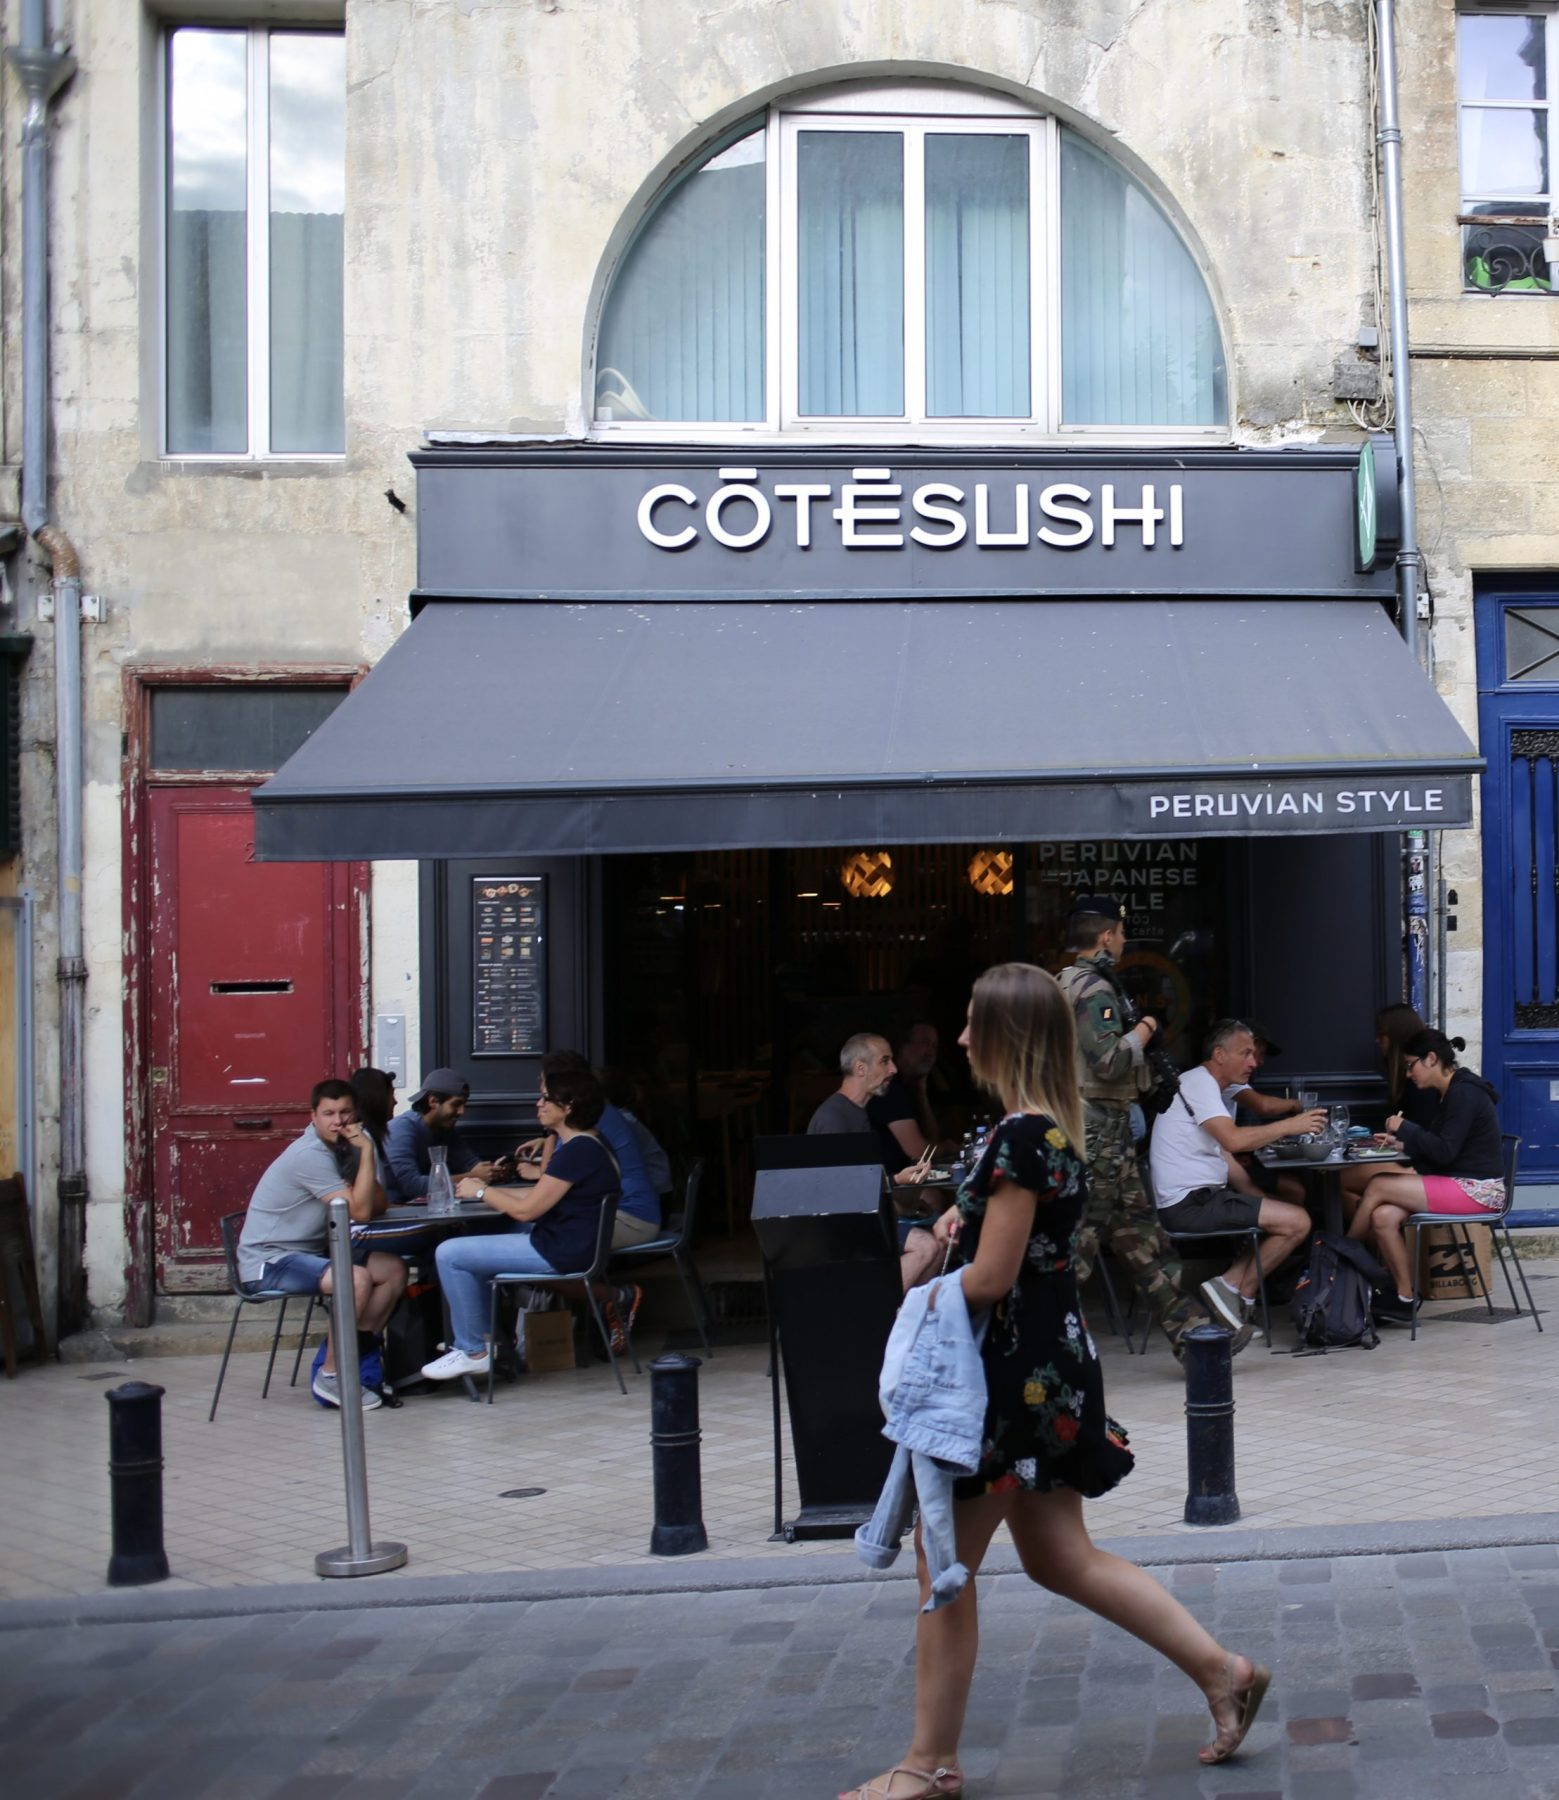 Coté Sushi: Japanese & Peruvian inspiration